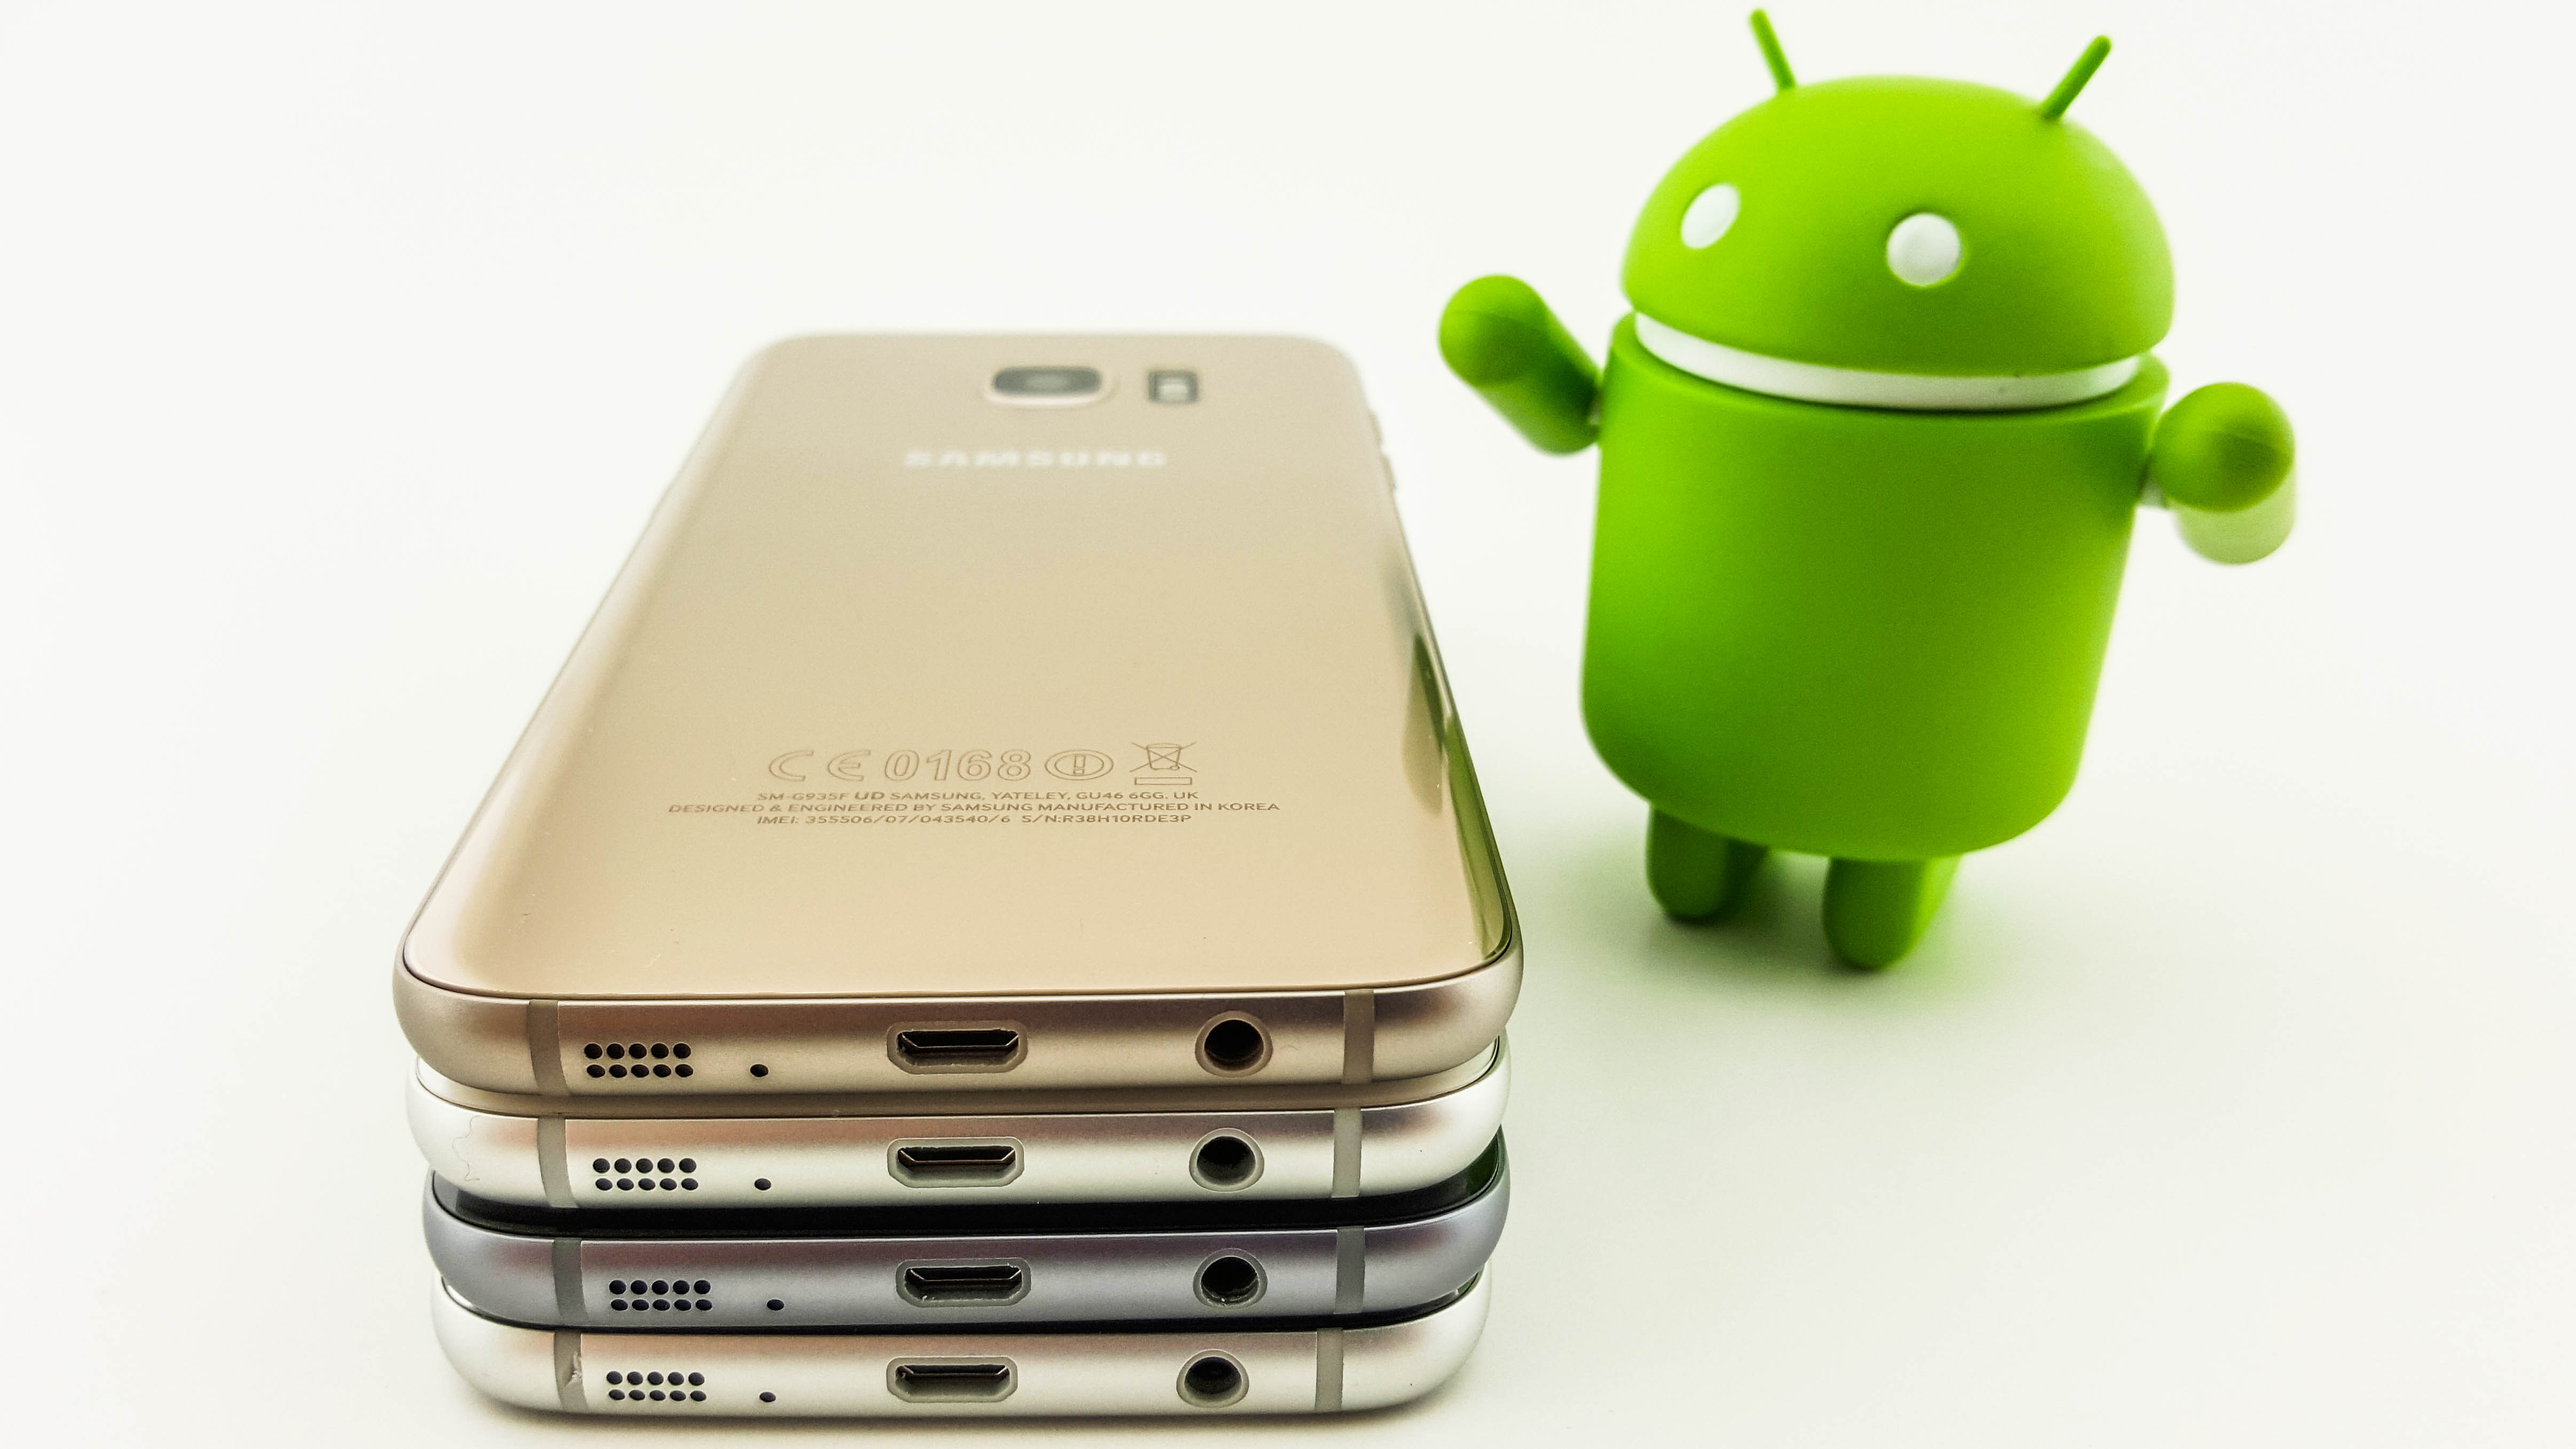 3 Reasons The Samsung Galaxy S7 Doesnt Have A Usb C Port Techradar Flashdisk Atau Flashdrive Otg Type Original